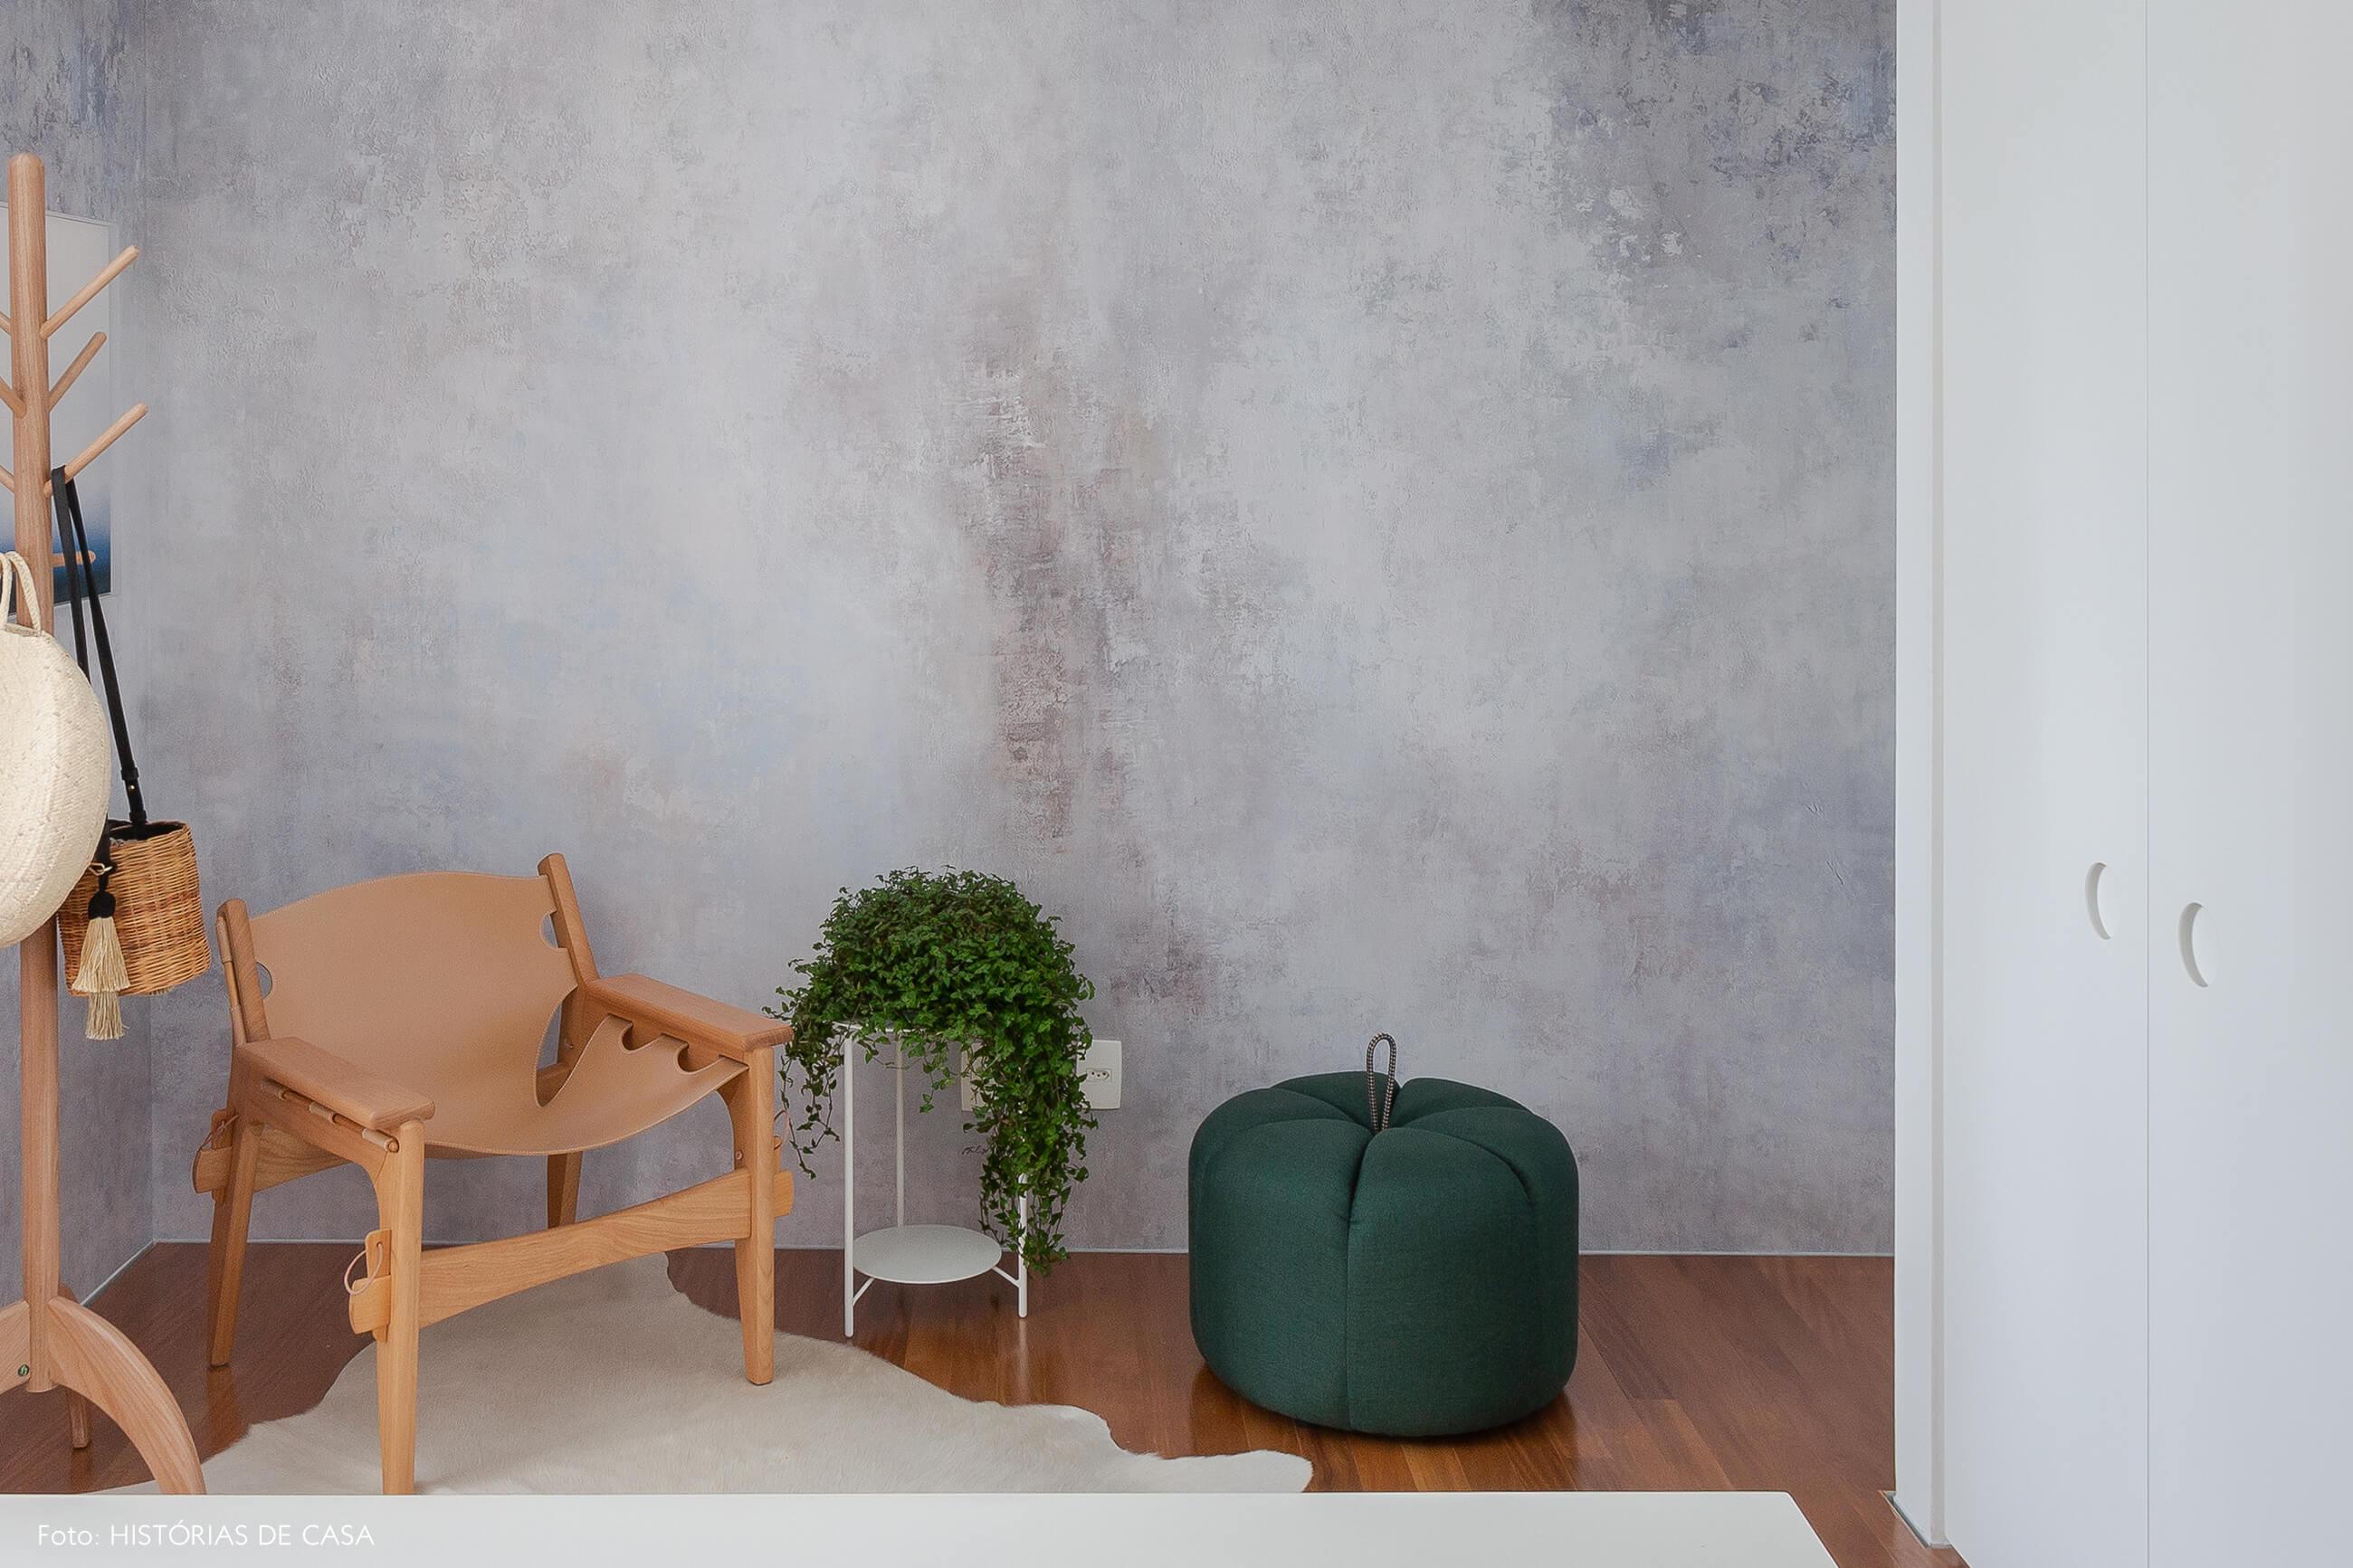 Papel de parede em tons de cinza da marca branco.